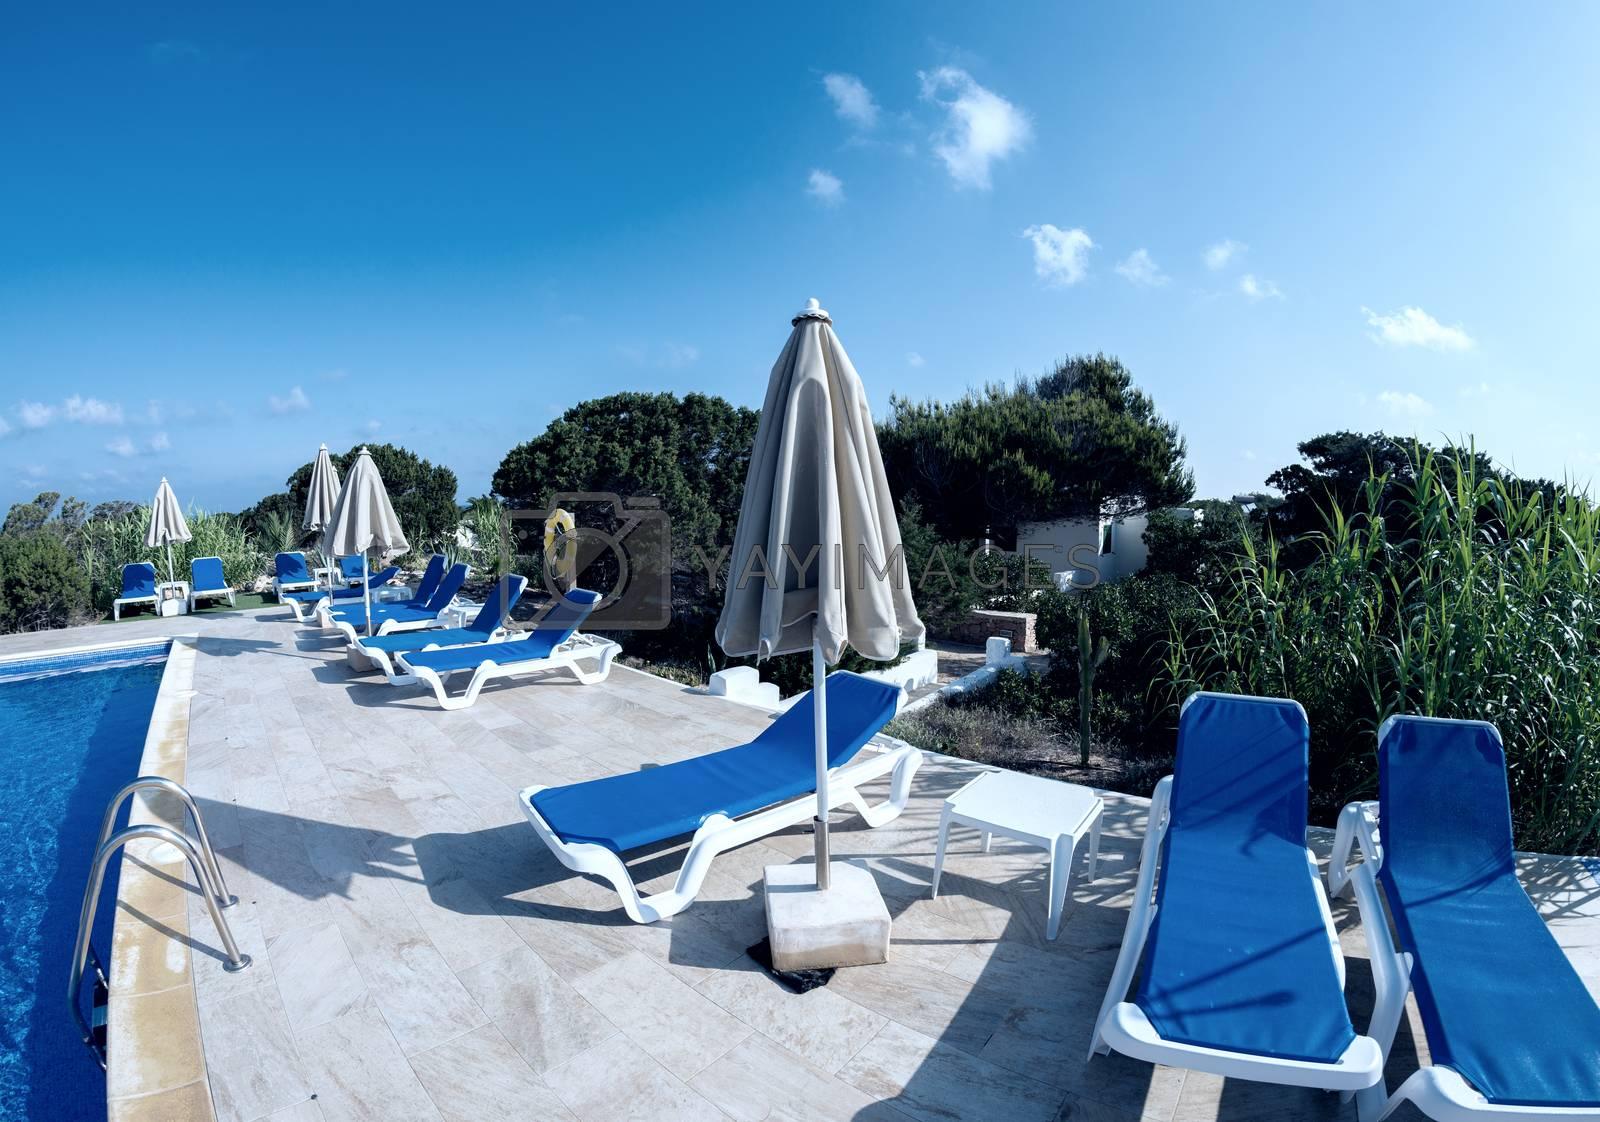 Empty sunbeds along a beautiful pool.